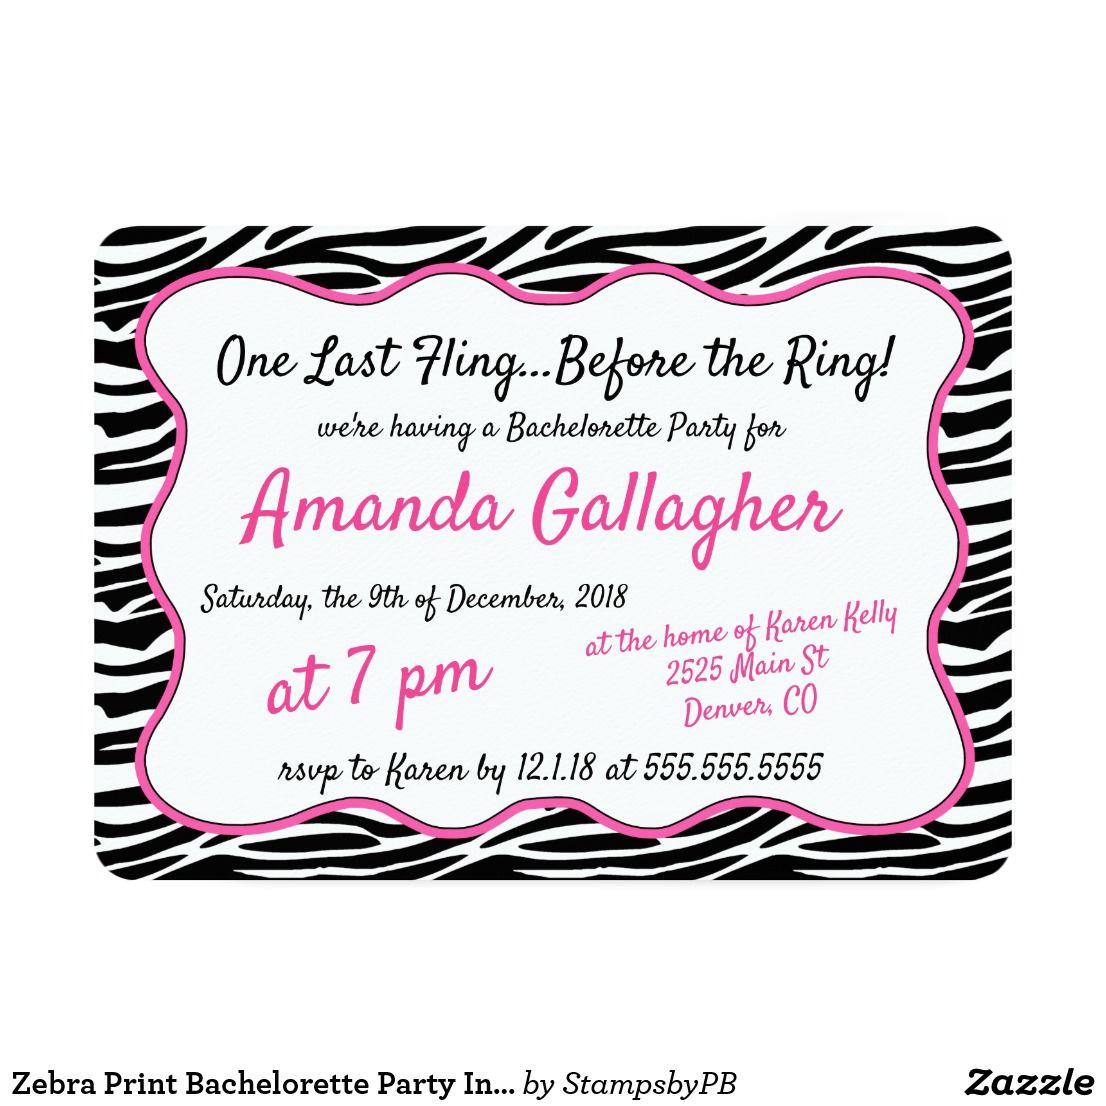 Zebra Print Bachelorette Party Invitation  Weddings Brides and